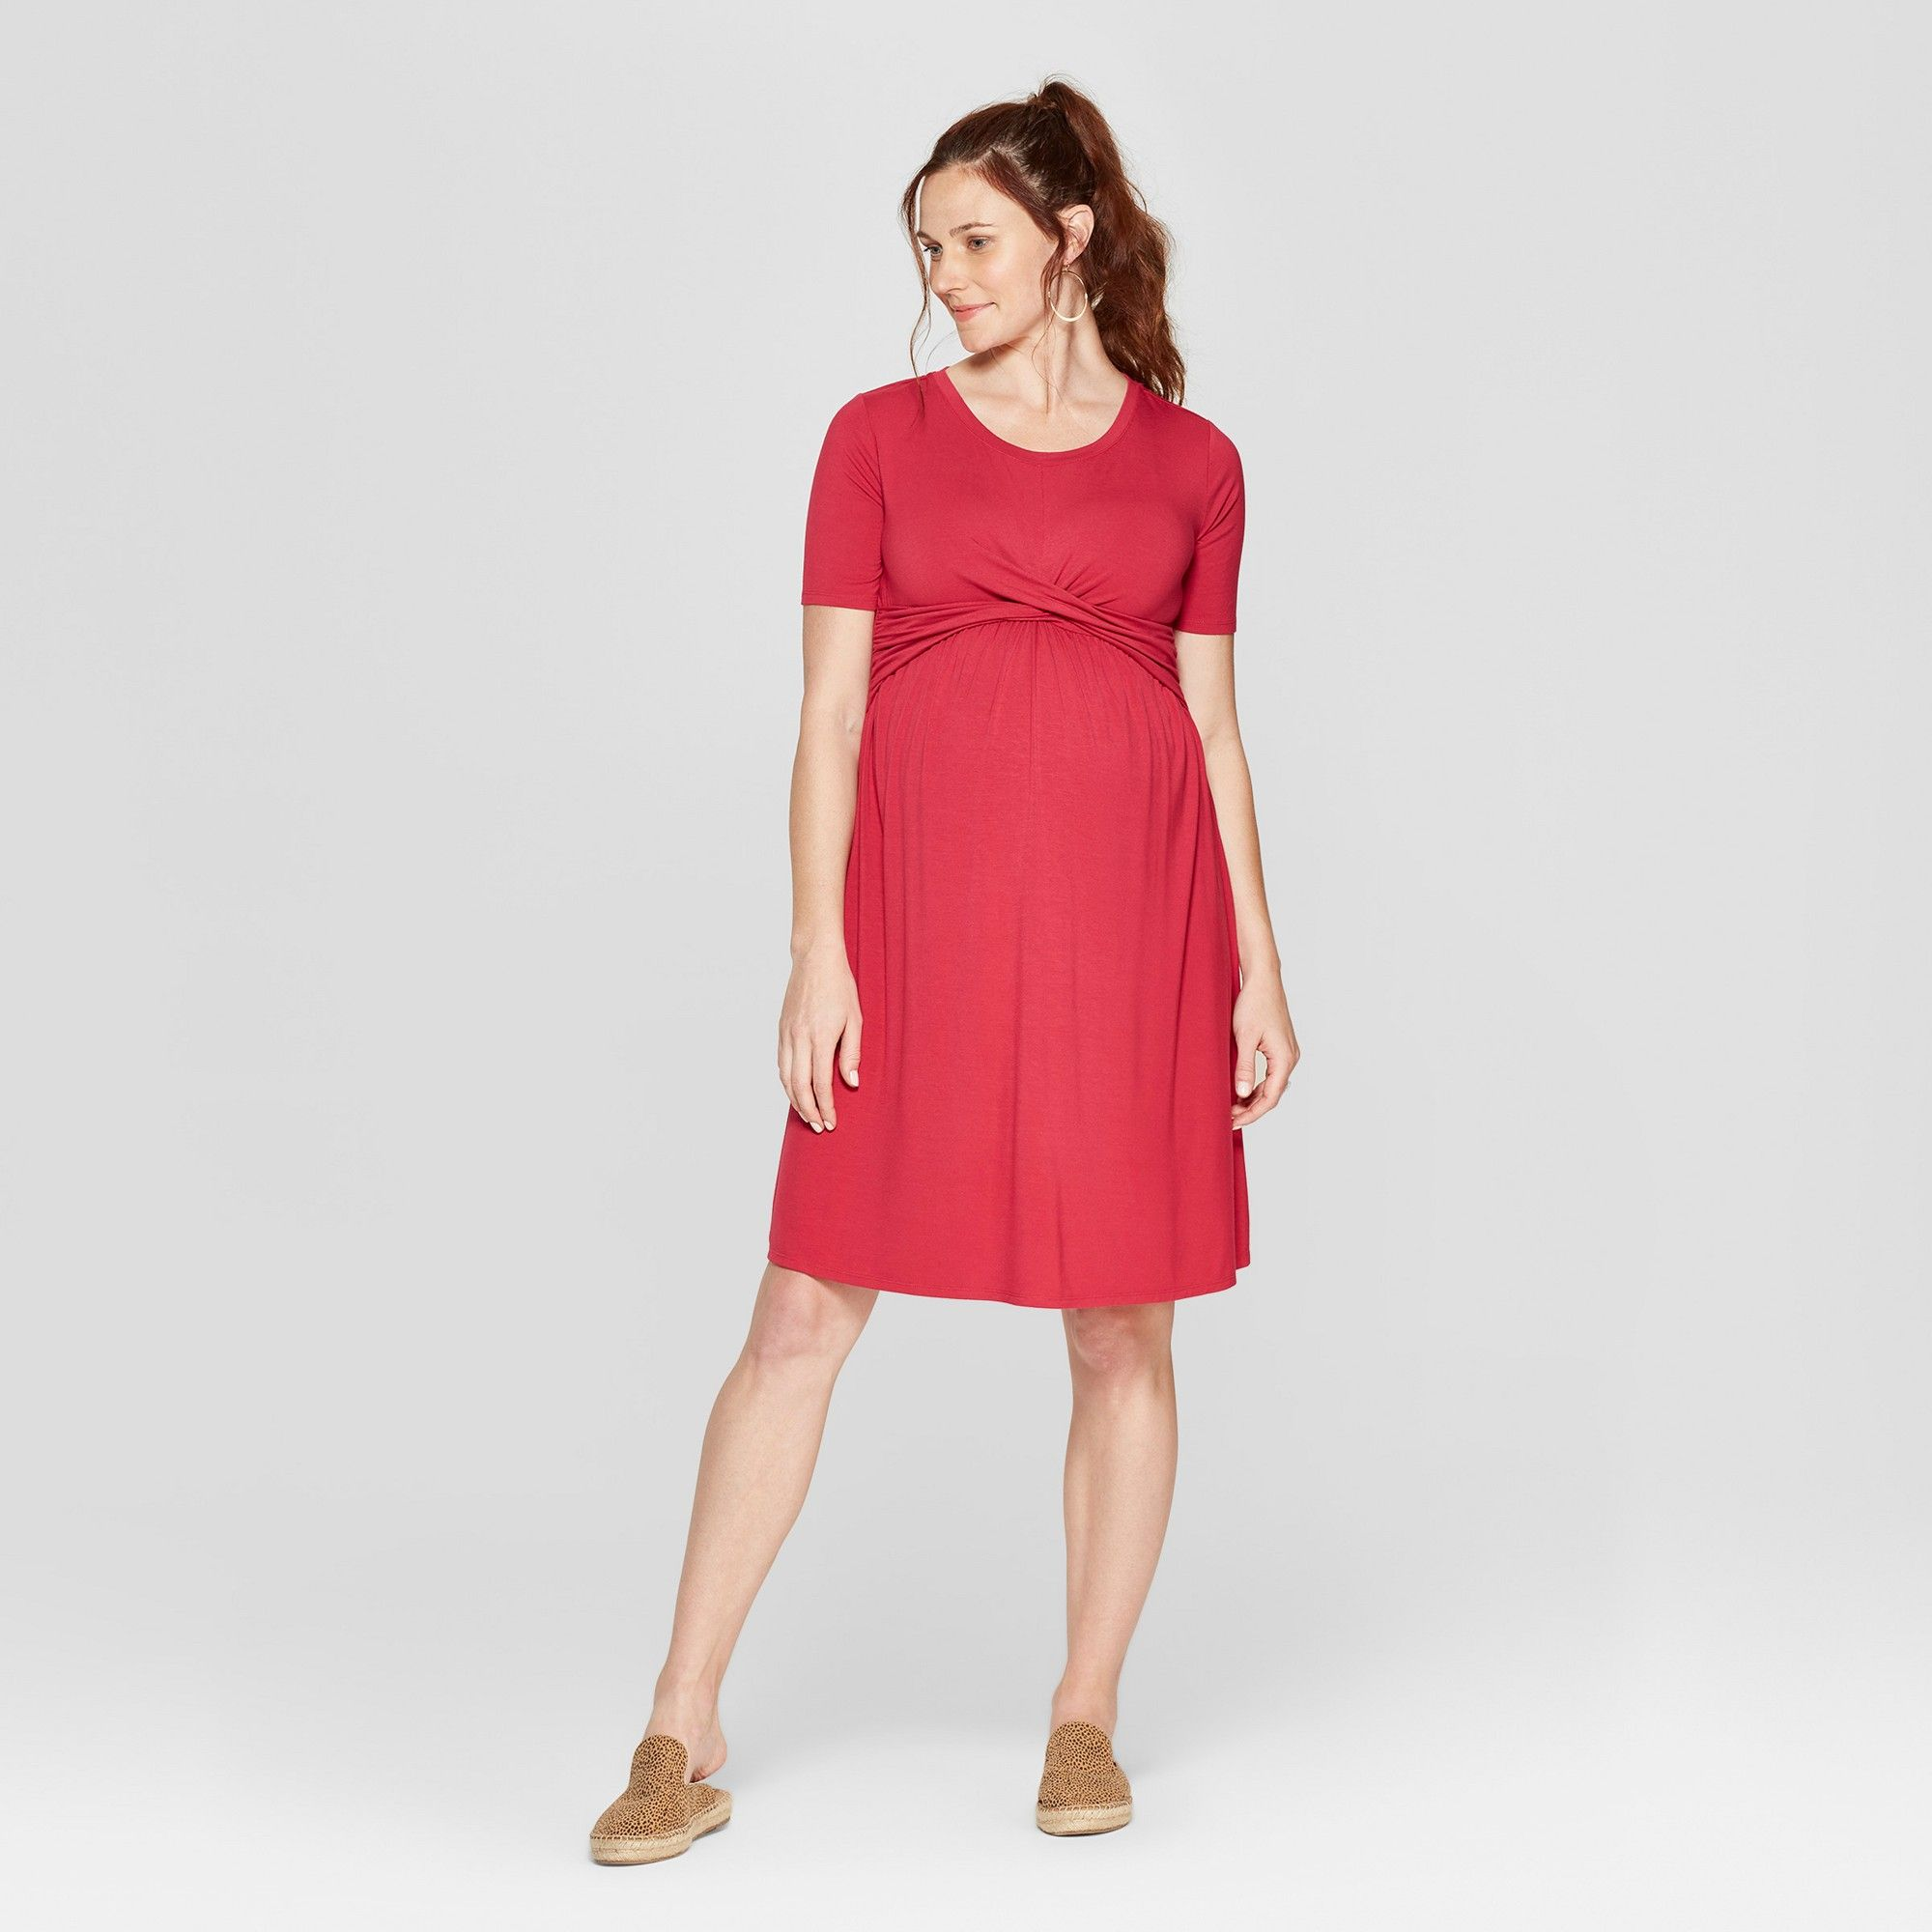 be743c9809f4a Maternity Twist Knit Dress - Isabel Maternity by Ingrid & Isabel Pumila  Rose Xxl